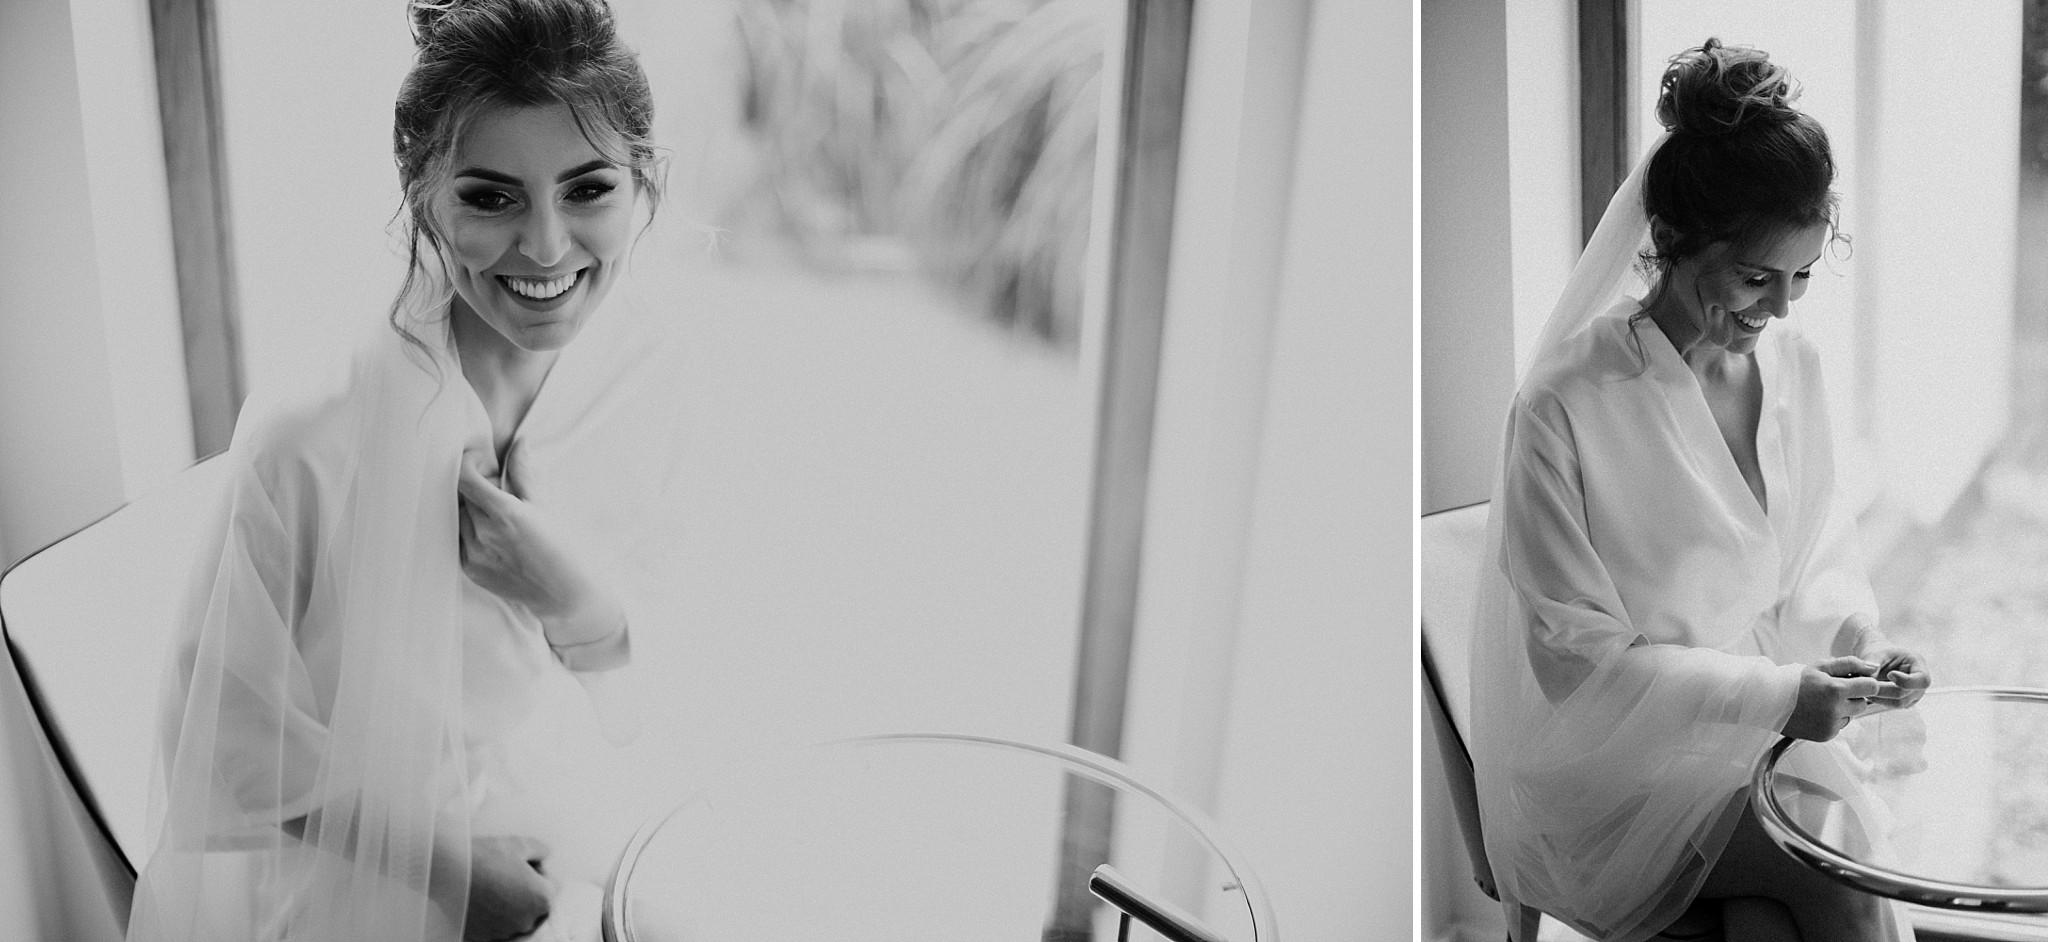 fotograf poznan wesele dobra truskawka piekne wesele pod poznaniem wesele w dobrej truskawce piekna para mloda slub marzen slub koronawirus slub listopad wesele koronawirus 031